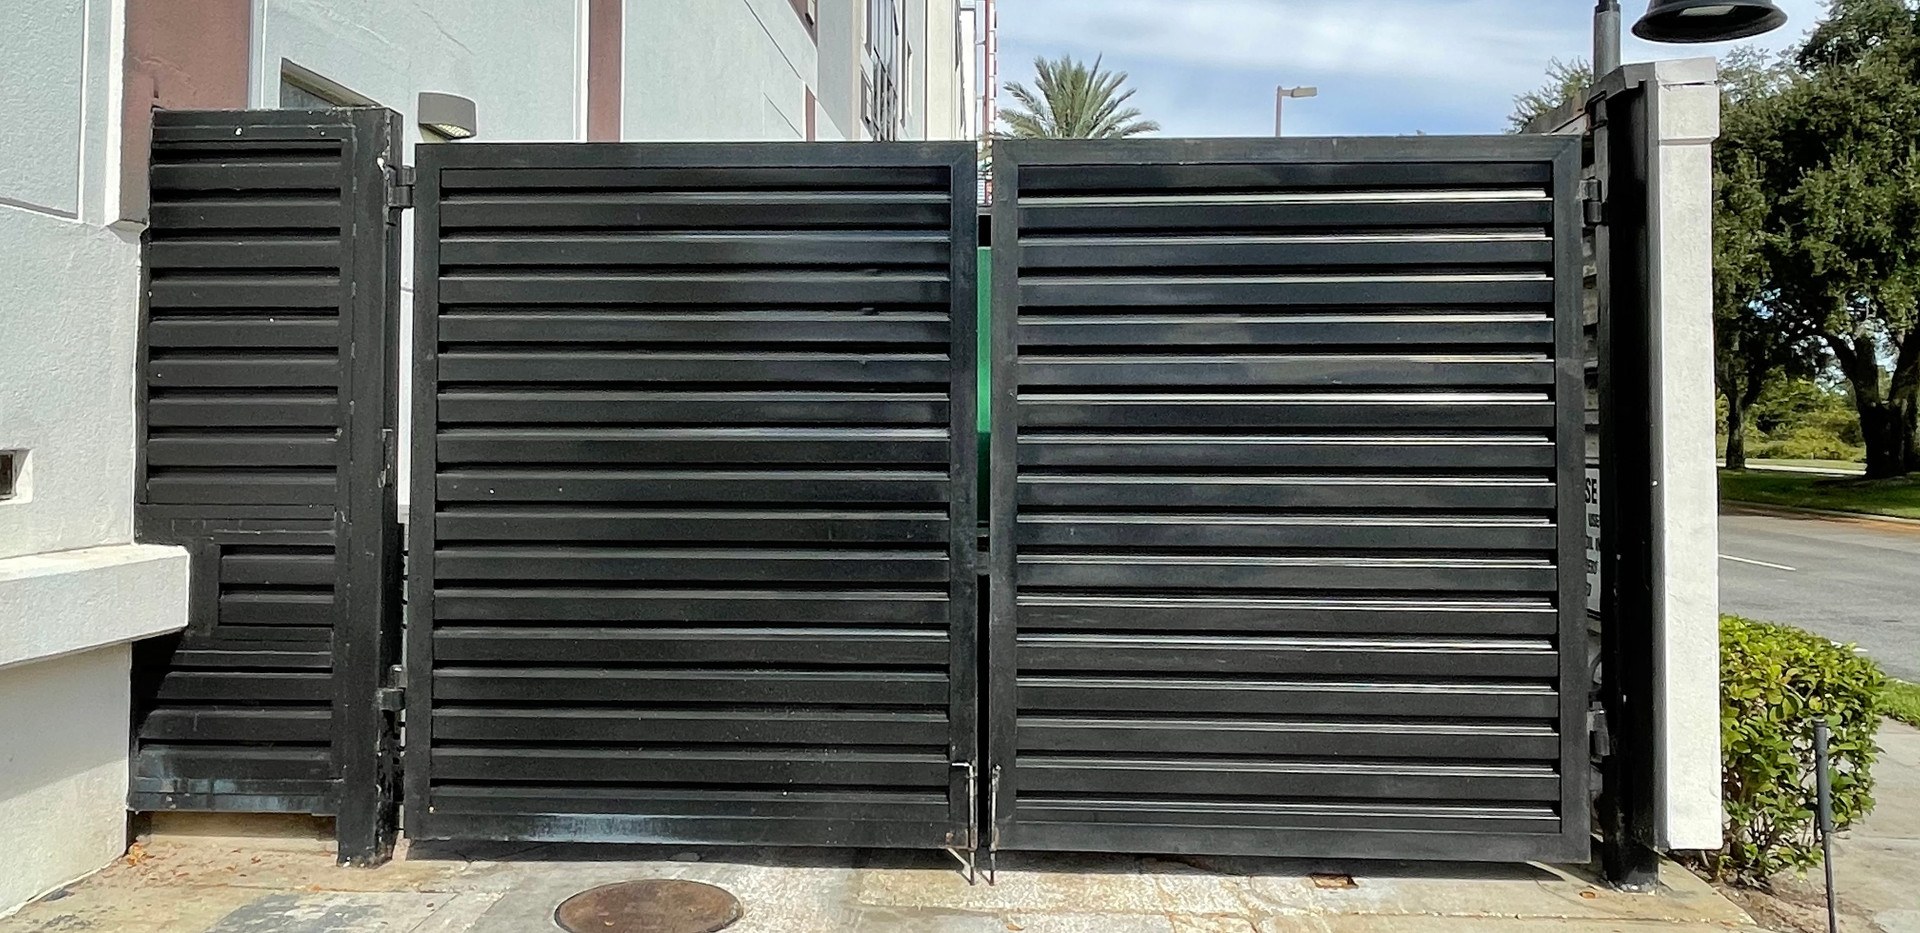 Brixmor Jumbo Dumpster Gates